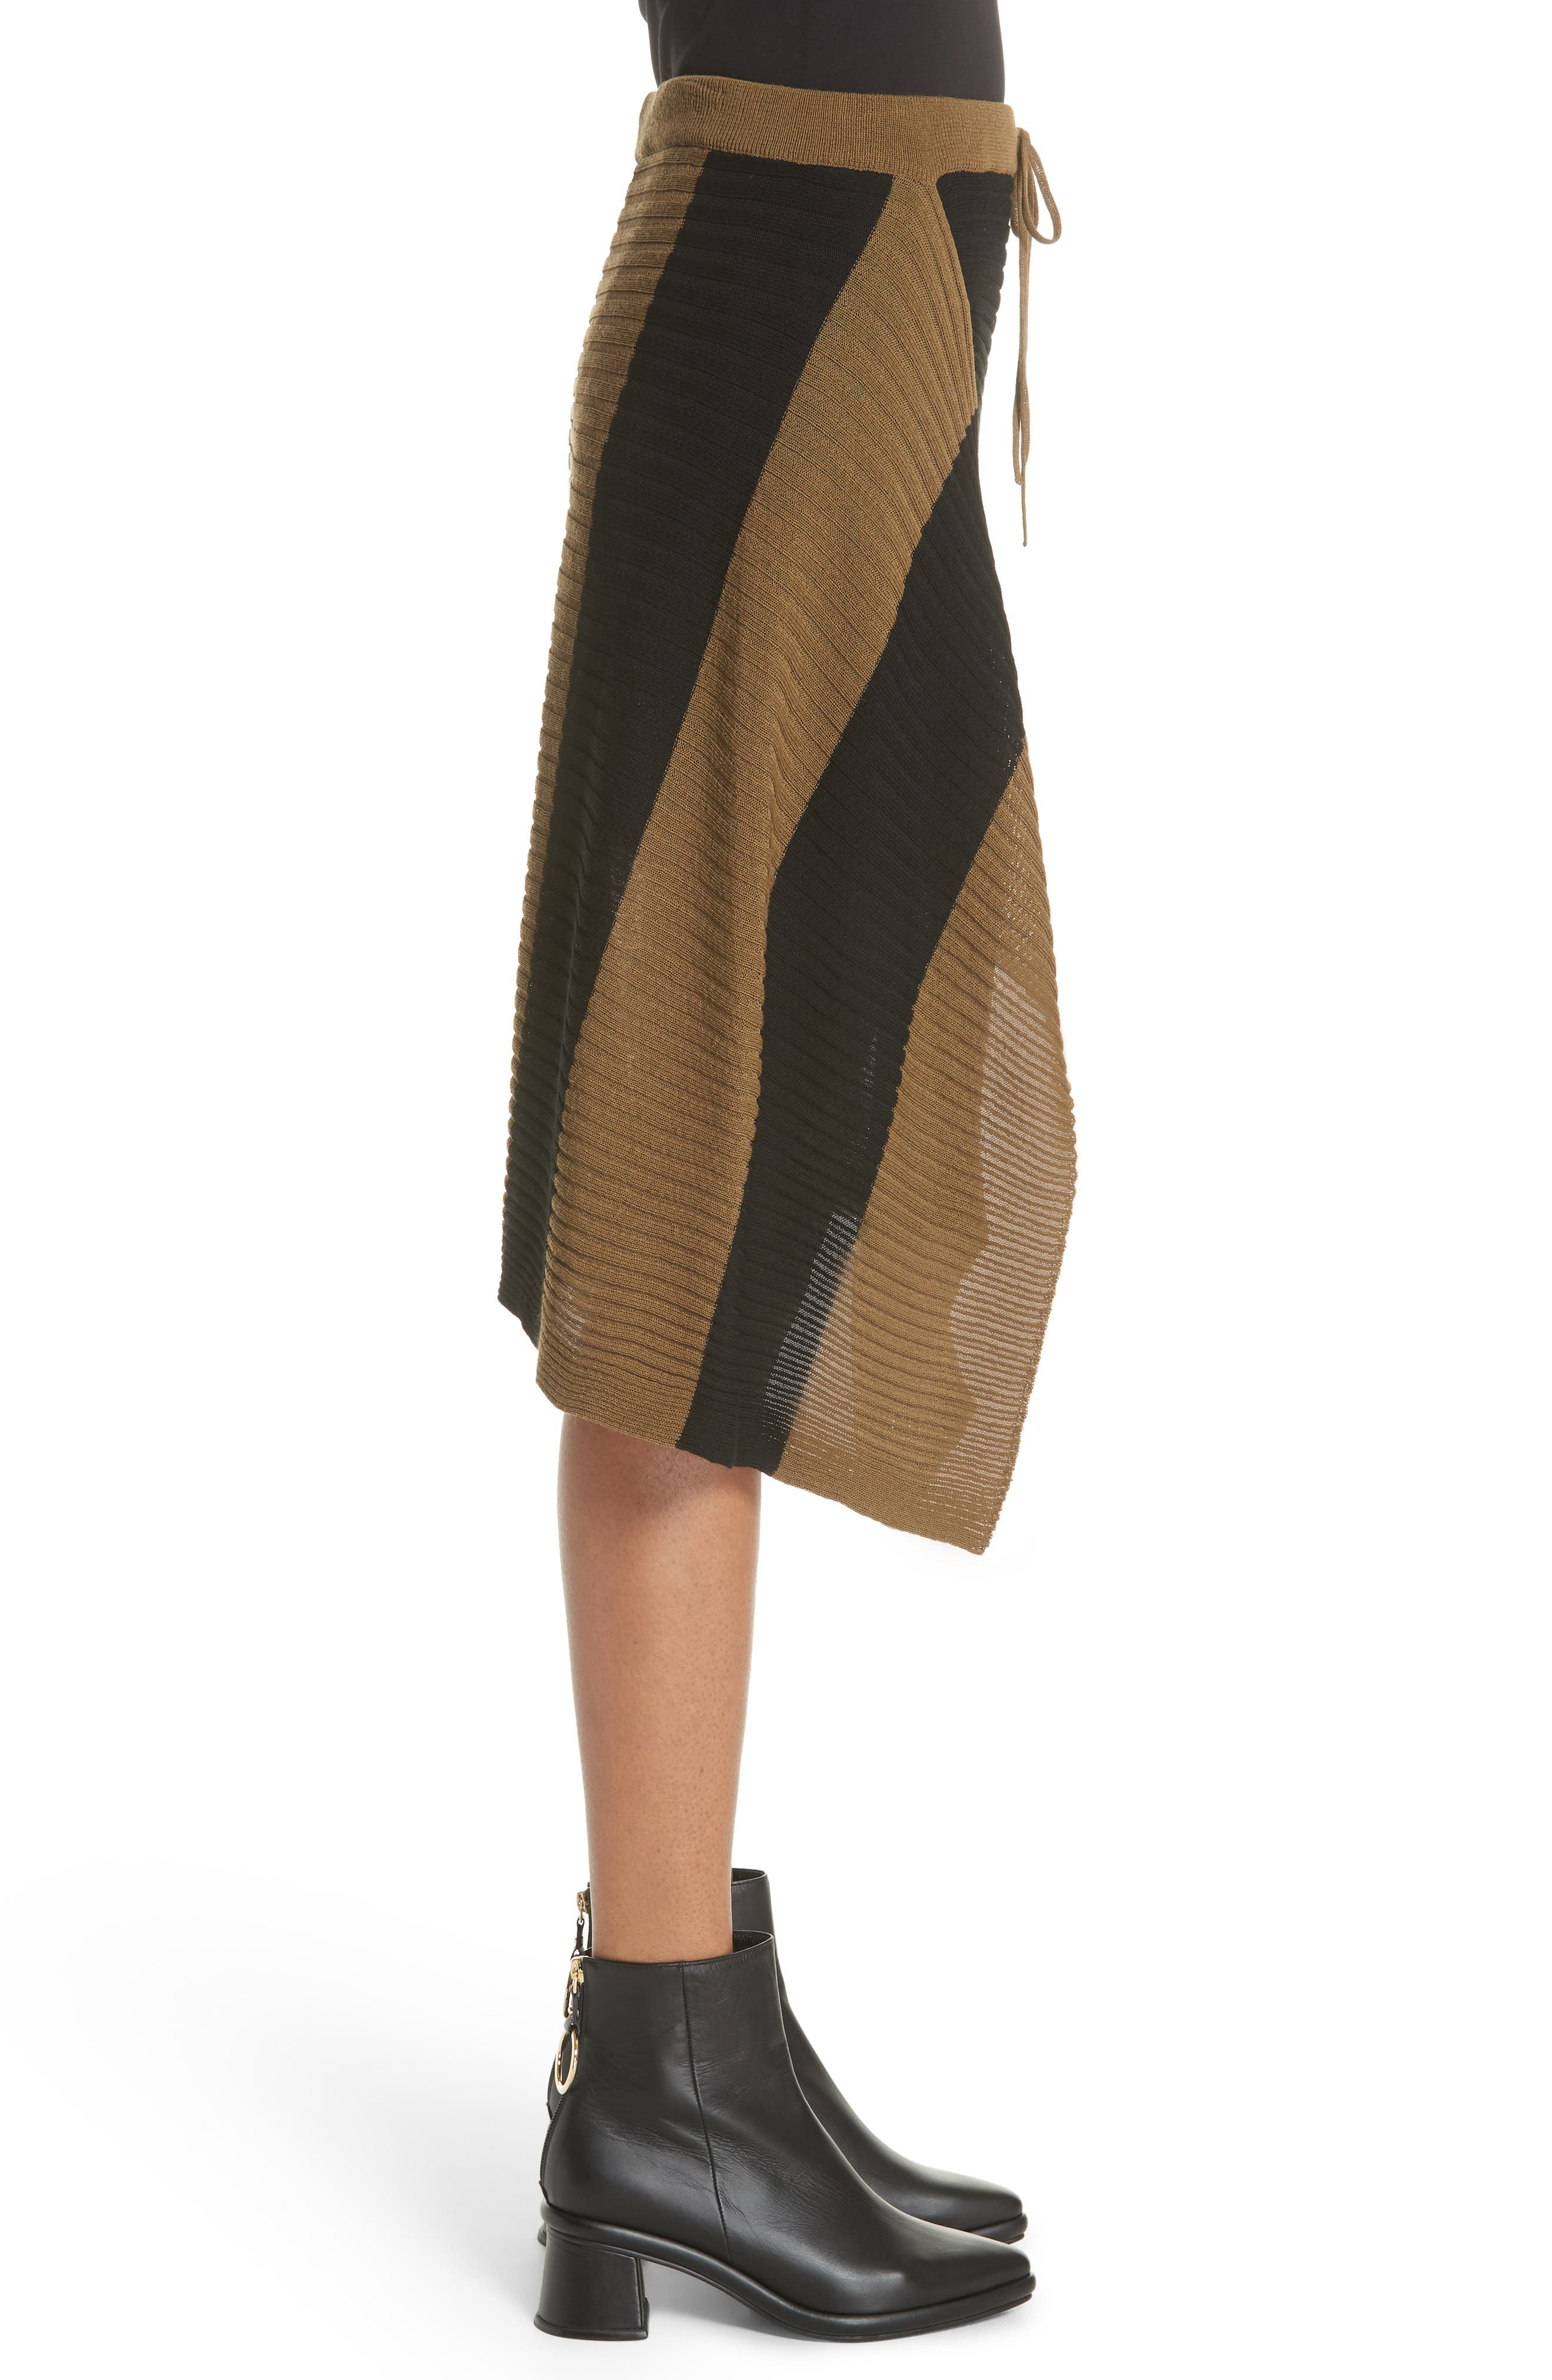 Marques'Almeida Draped Skirt,                             Alternate thumbnail 3, color,                             Khaki/ Black